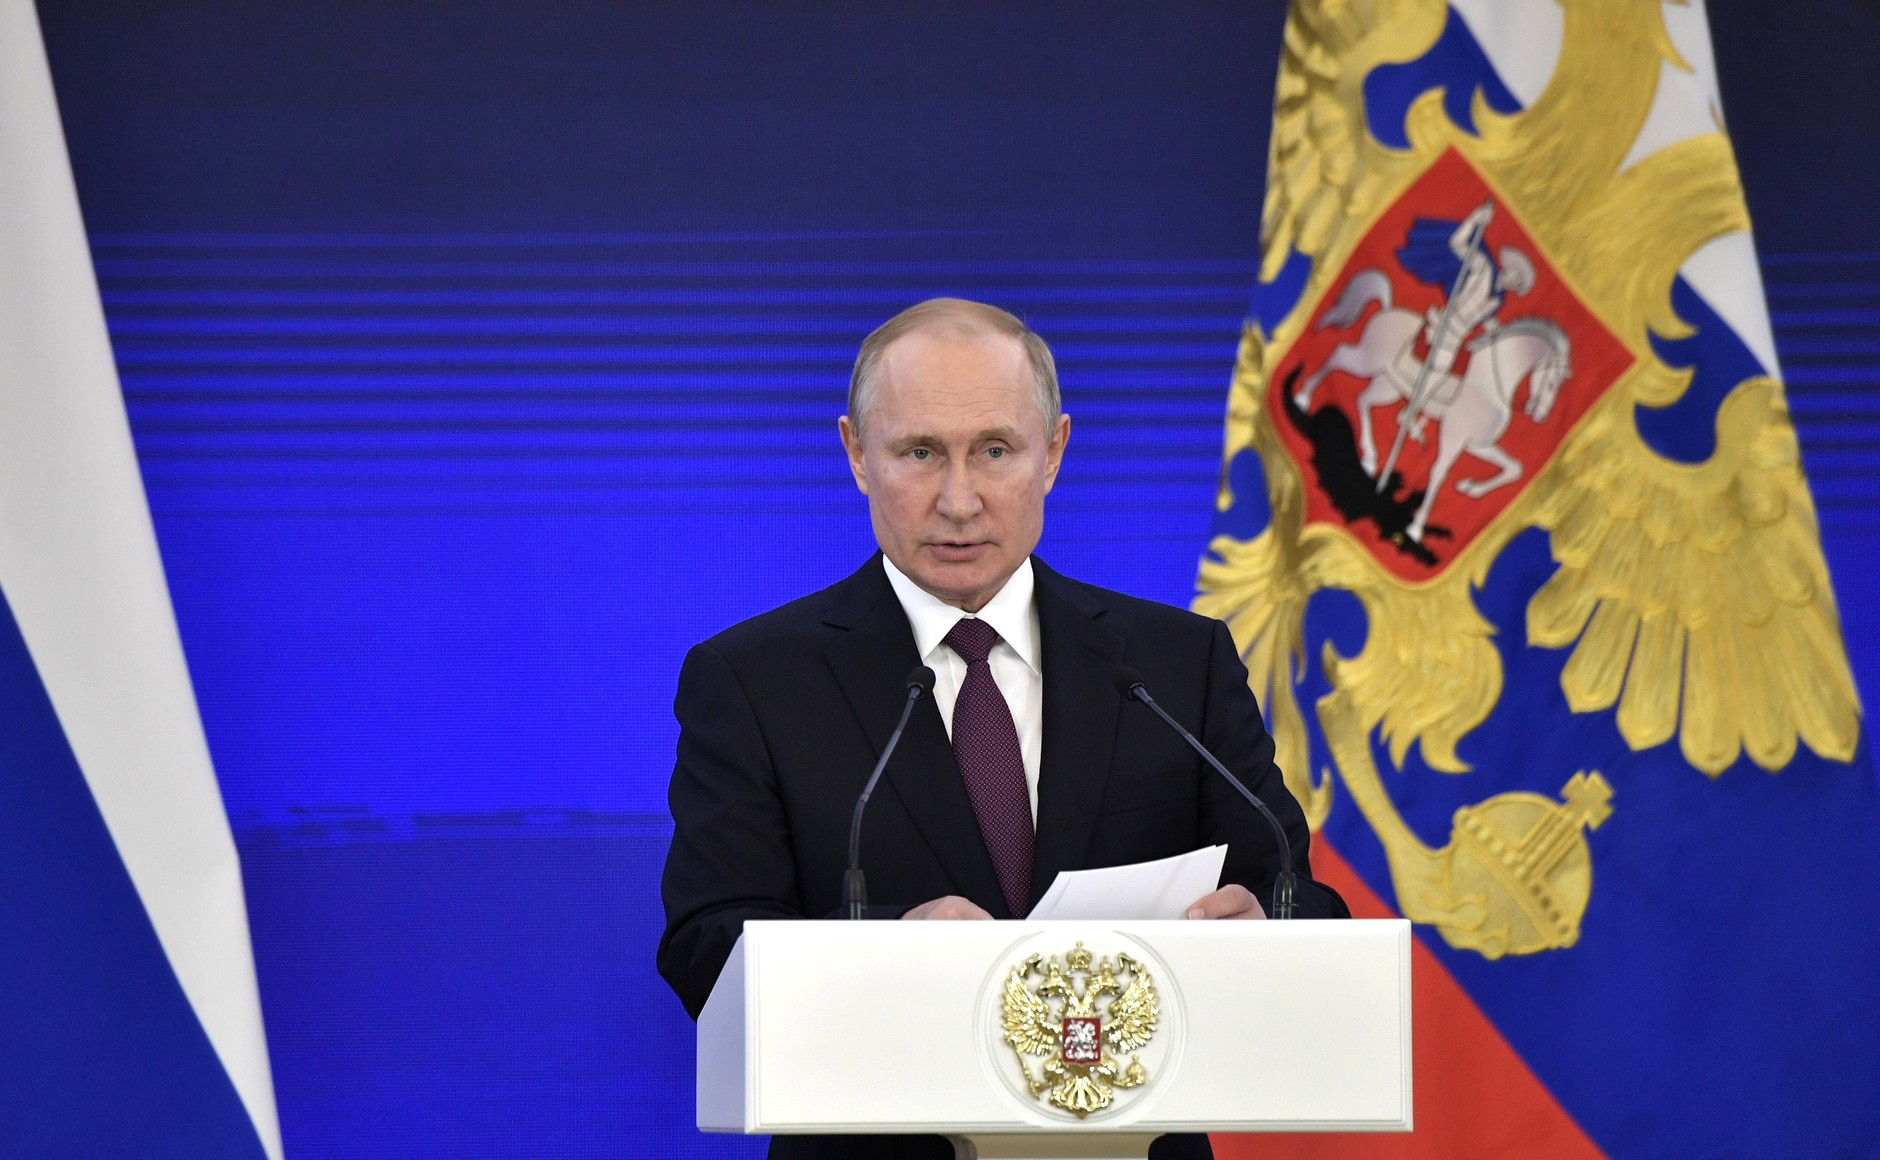 Vladimir Putin, President of the Russian Federation (credits: kremlin.ru)